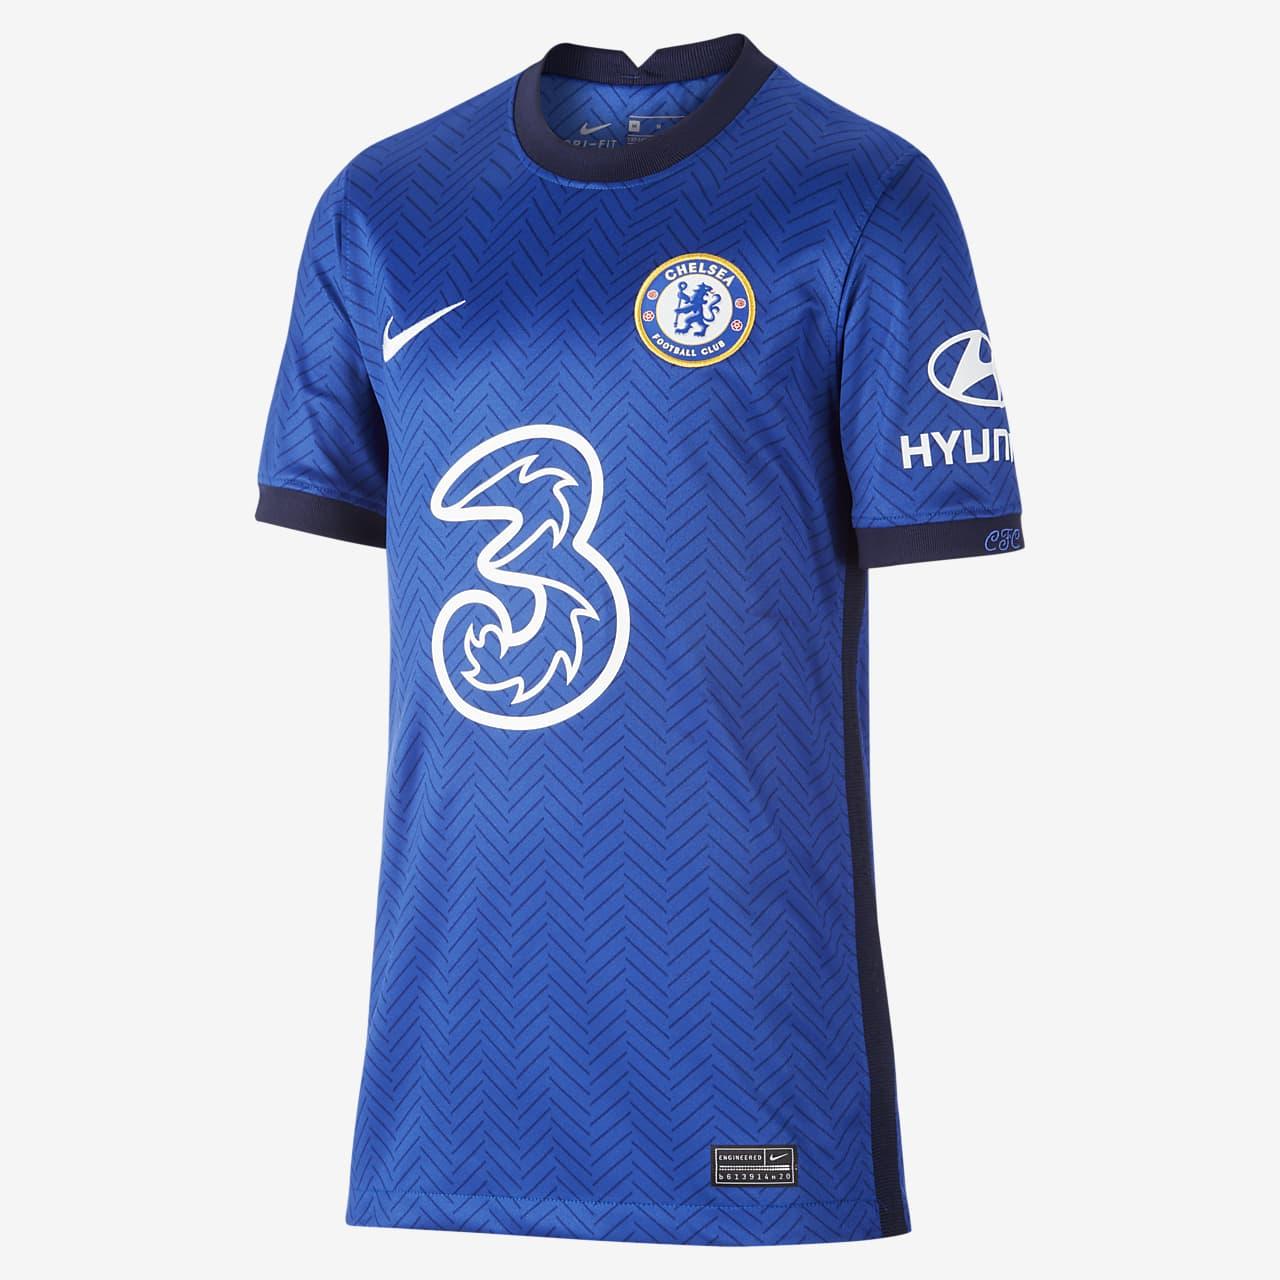 Chelsea 2020/21 Home Shirt